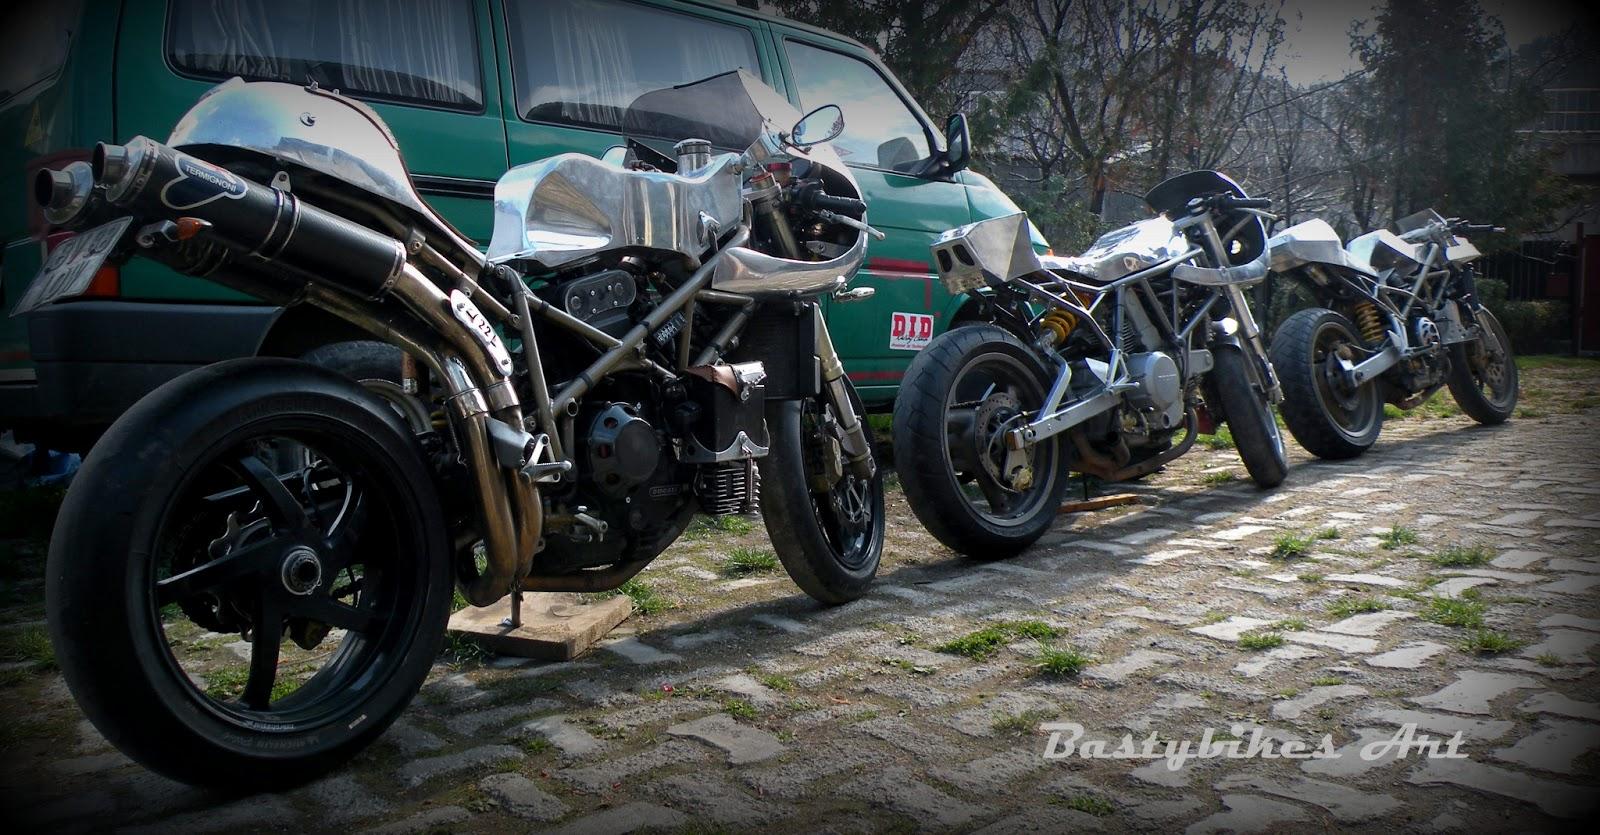 Ducati Gallery Ducati Streetfighter For Sale